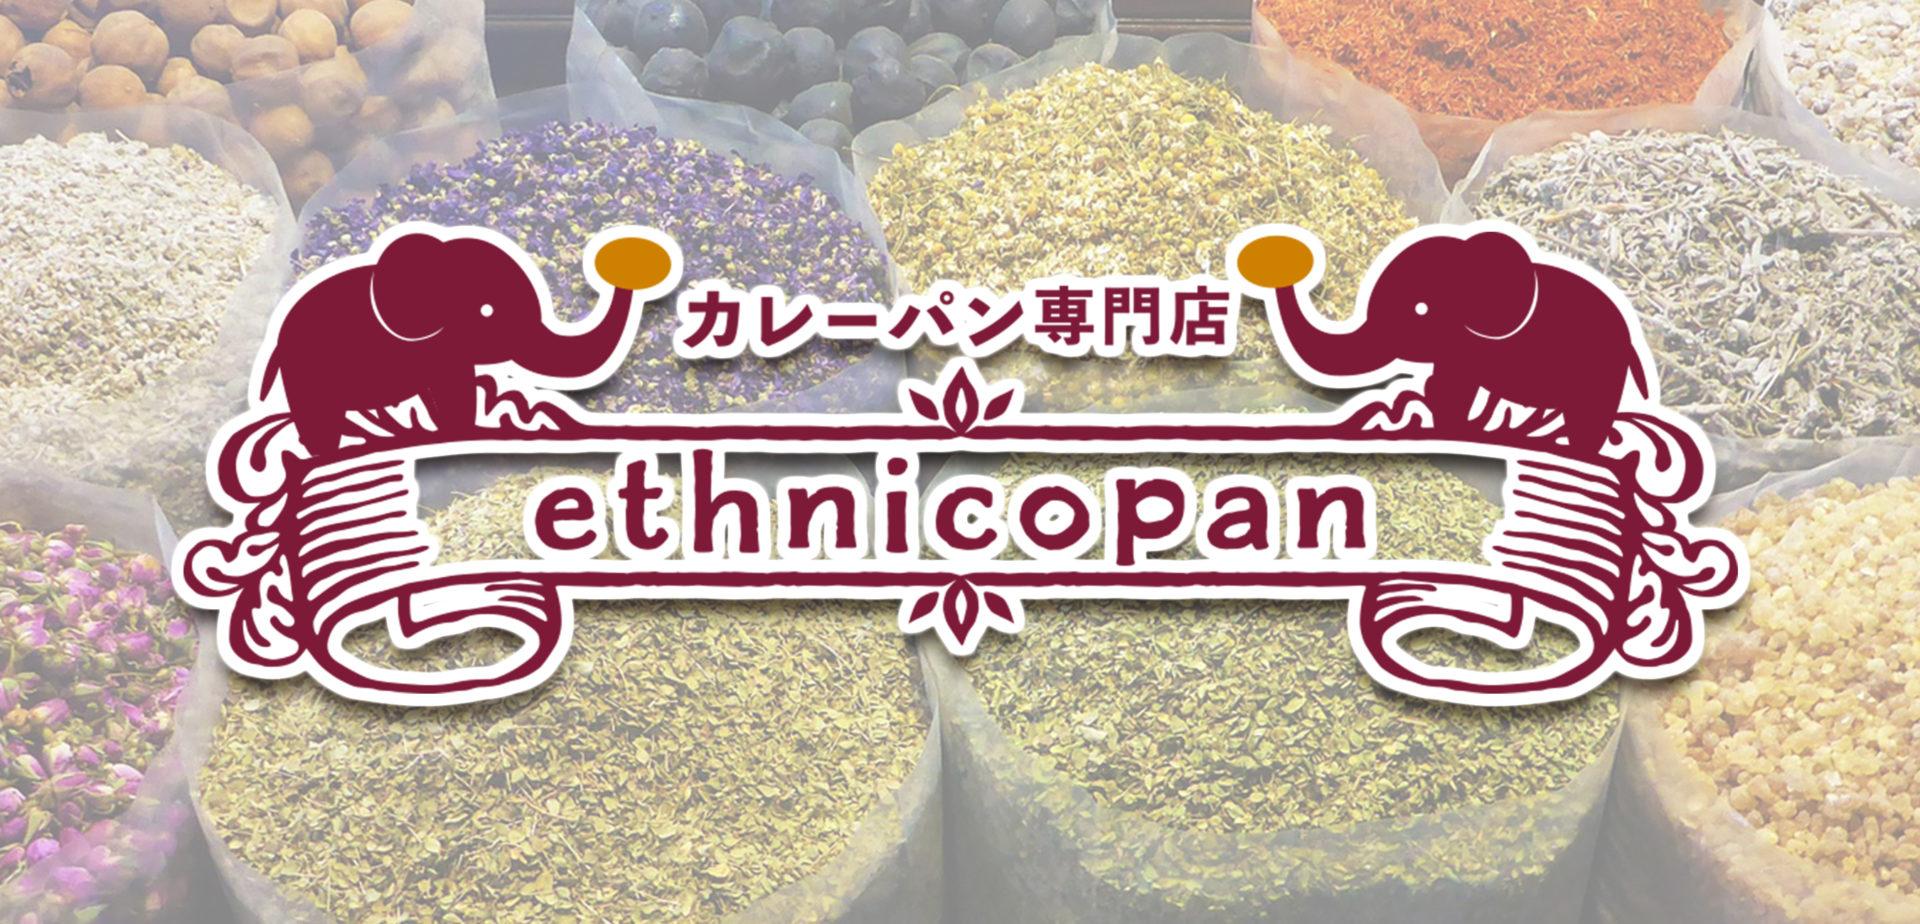 ethnicopan_header@2x